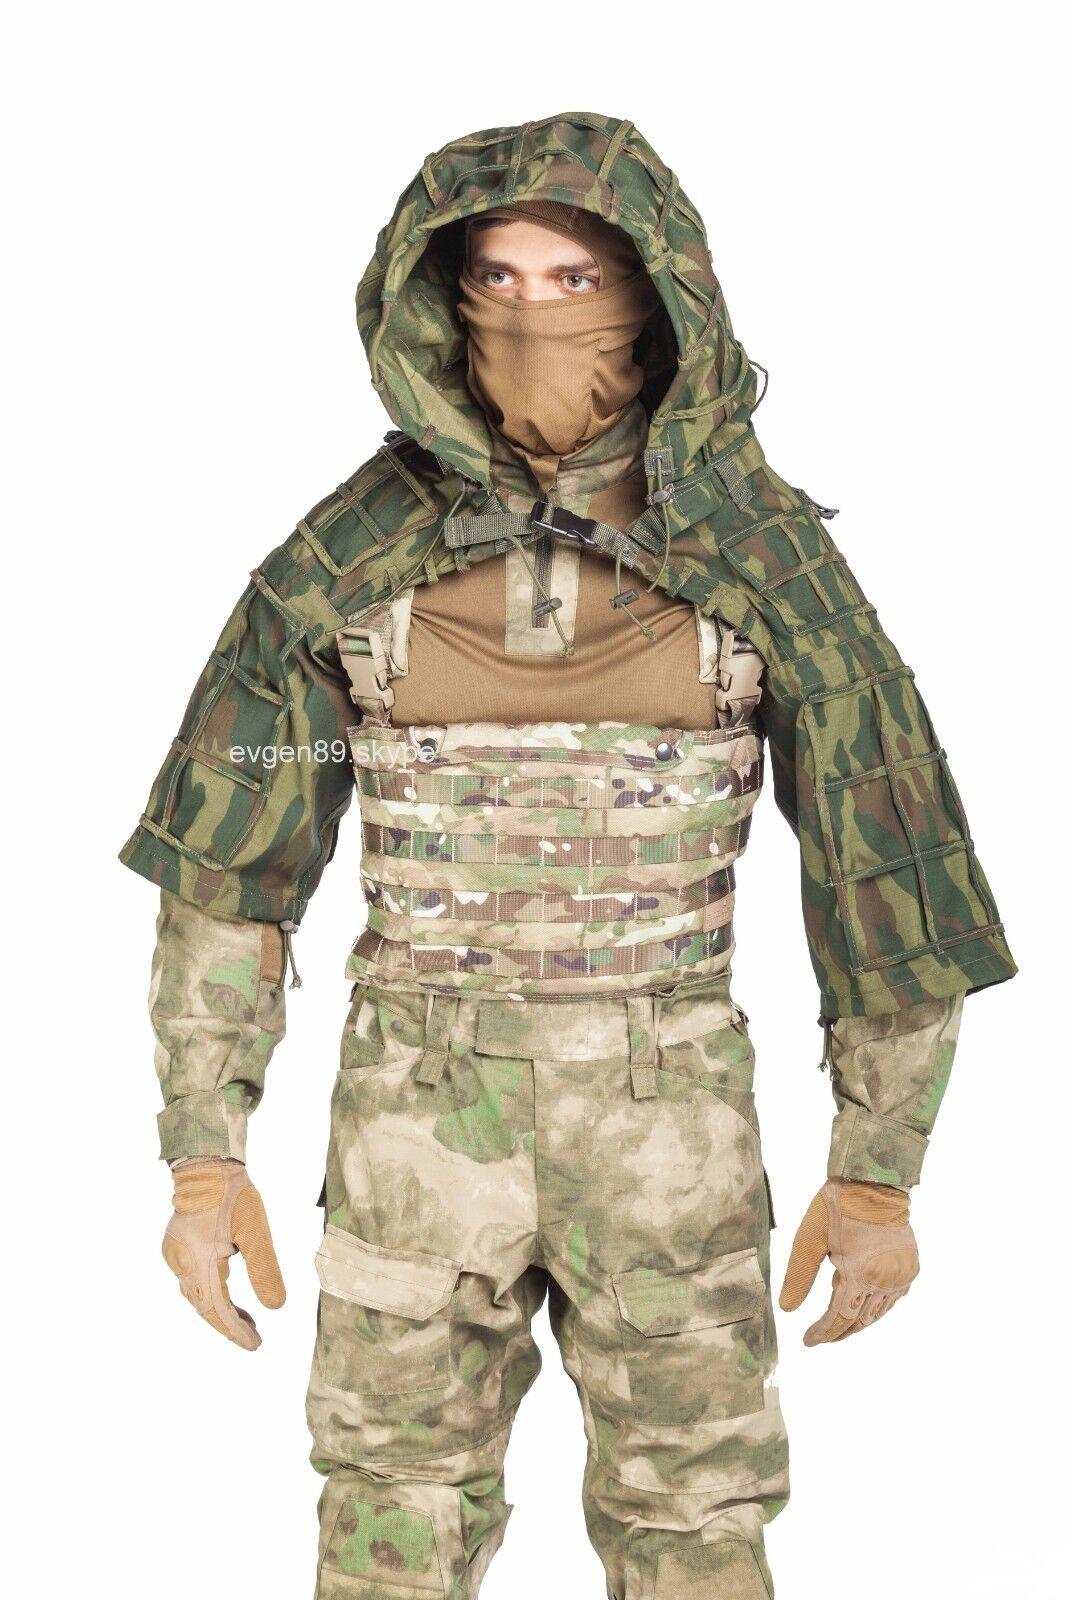 Disguise Sniper Coat    Viper Hood Russian Spetsnaz Ripstop Flora VSR-98  most preferential